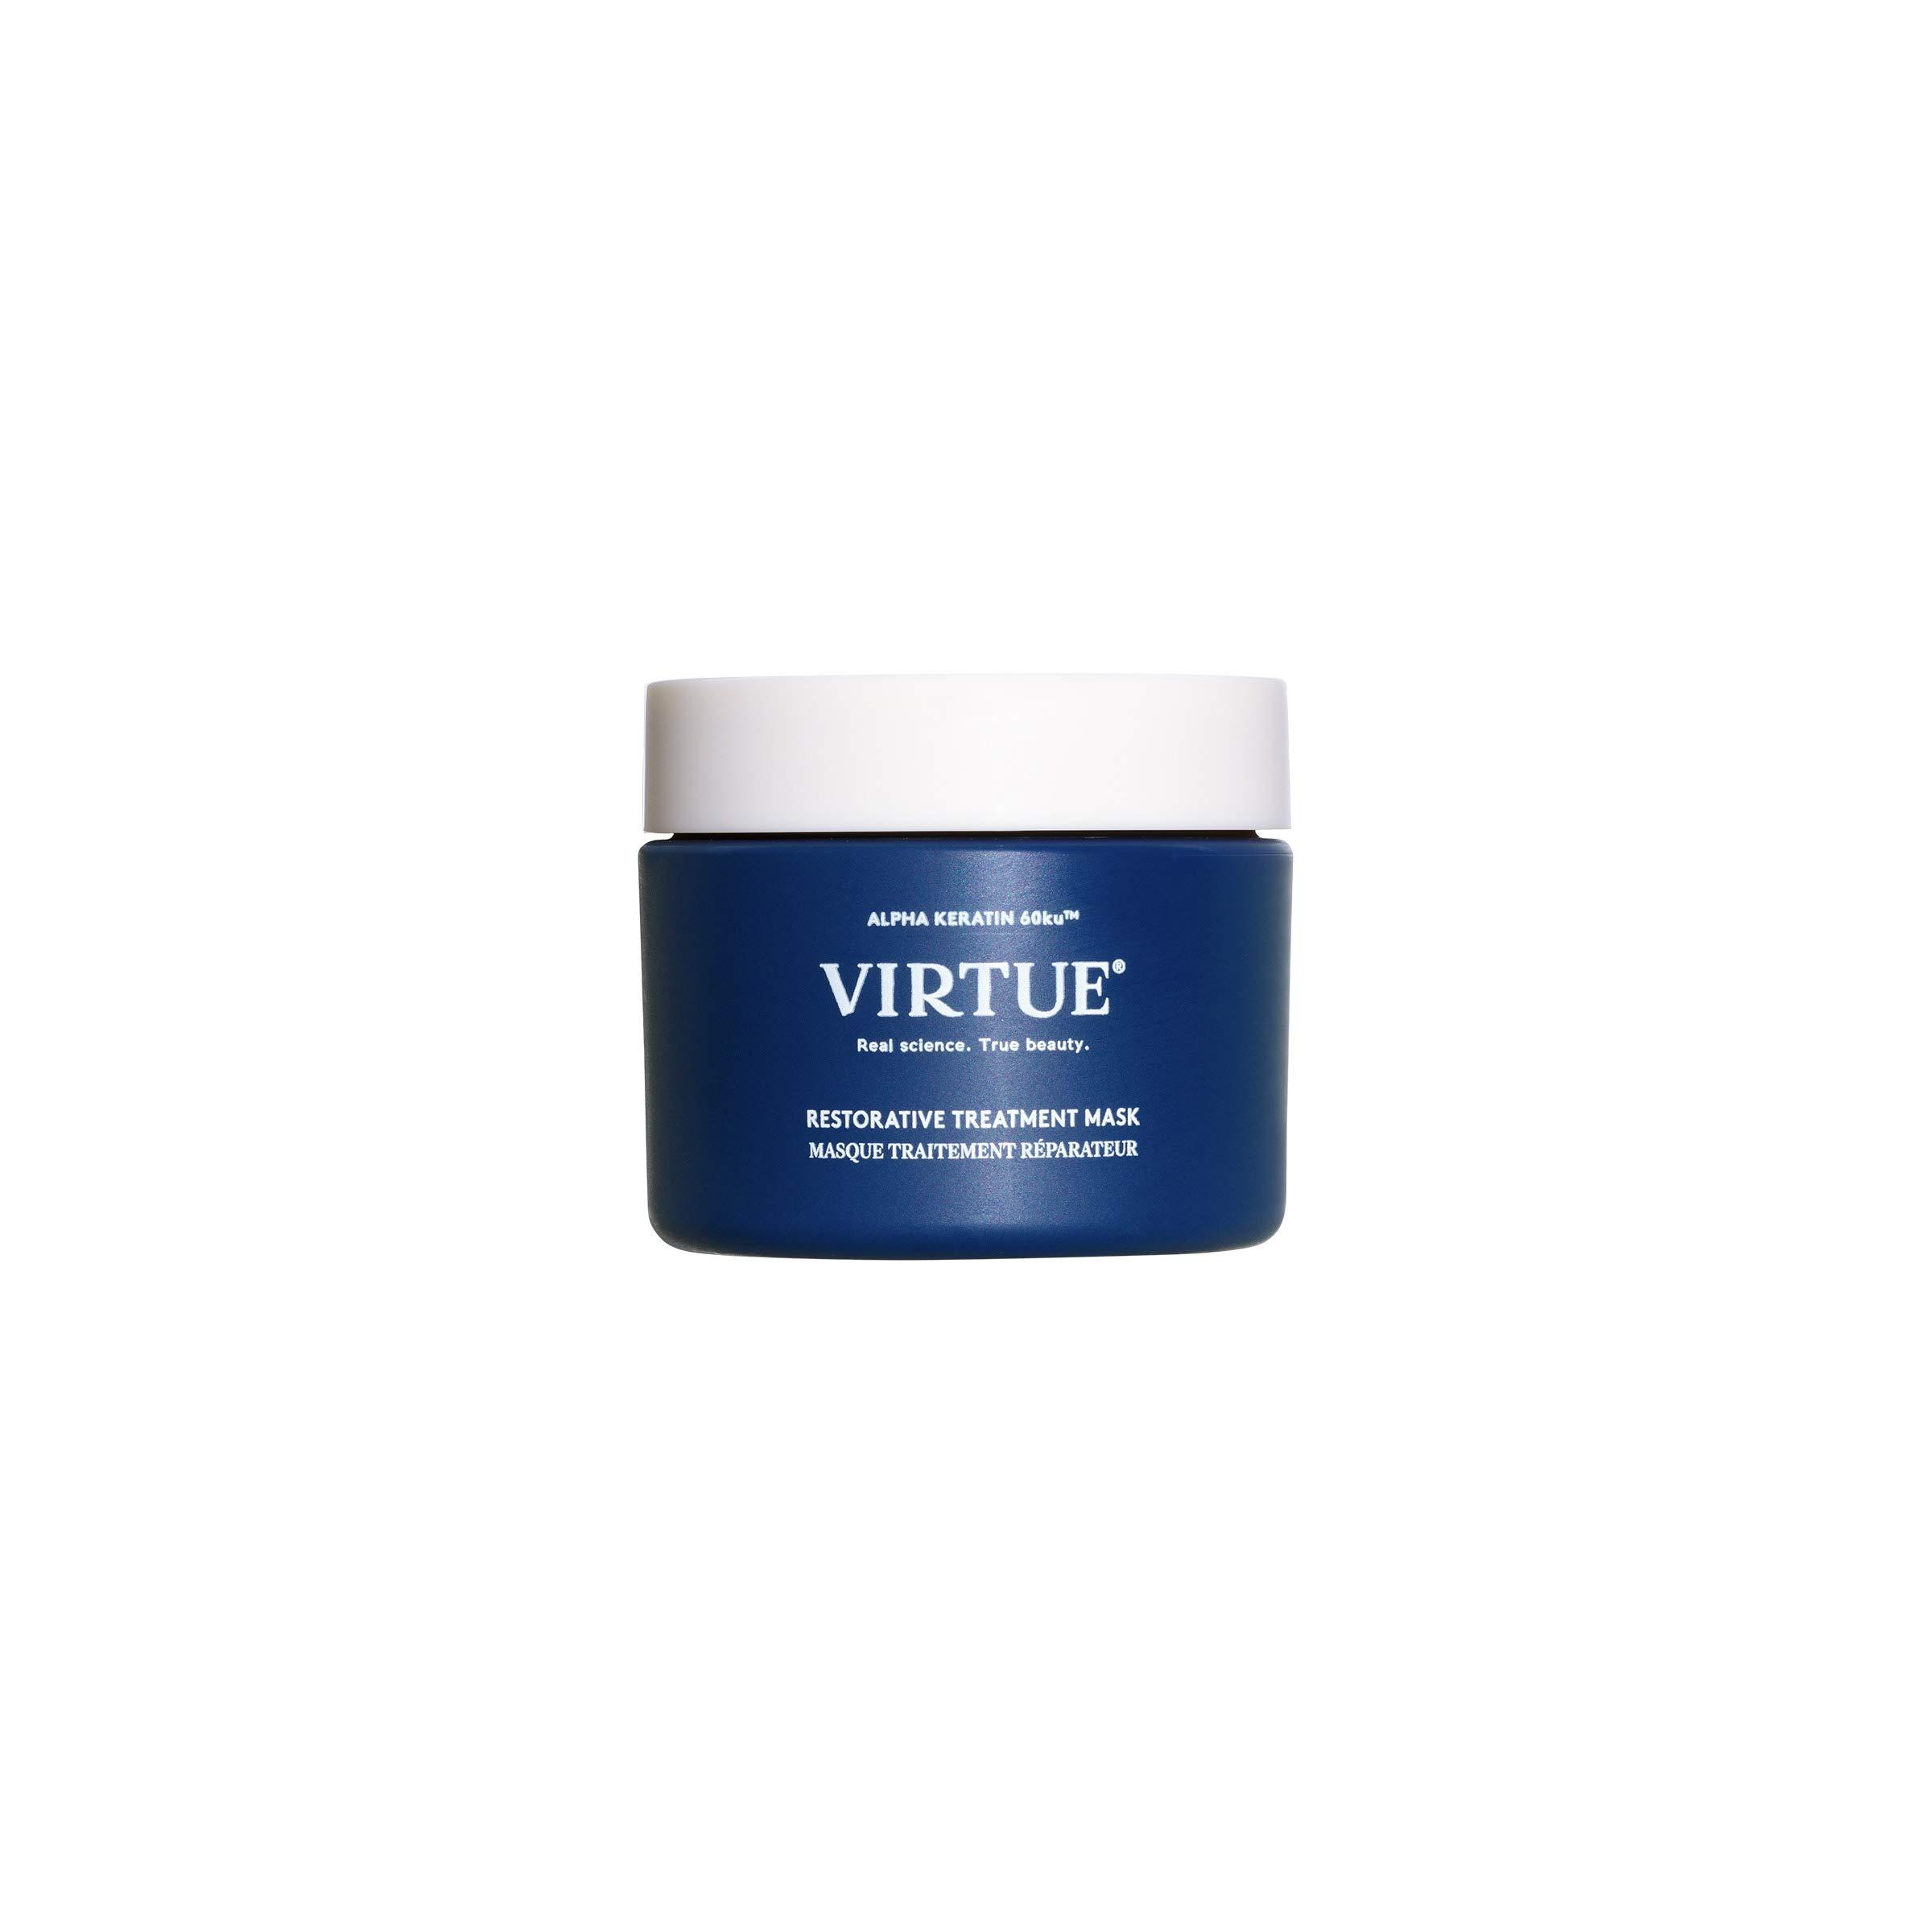 VIRTUE Restorative Treatment Mask 1.7 FL OZ   Rebuilds, Strengthens, Silkens  For Silky, Soft Hair by virtue